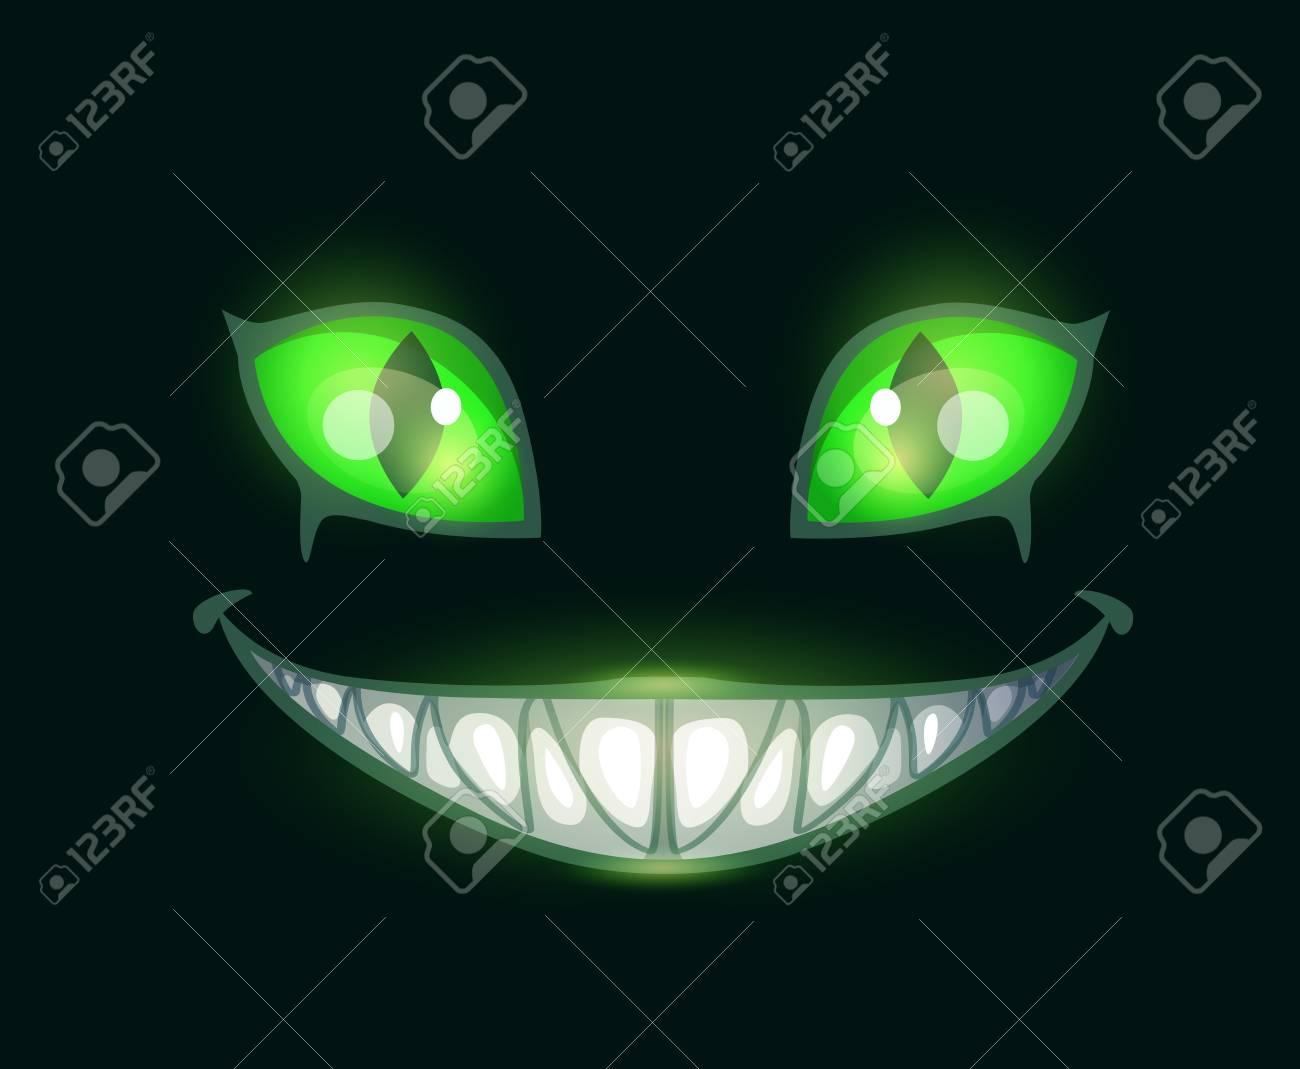 Cartoon scary monster face - 90273539